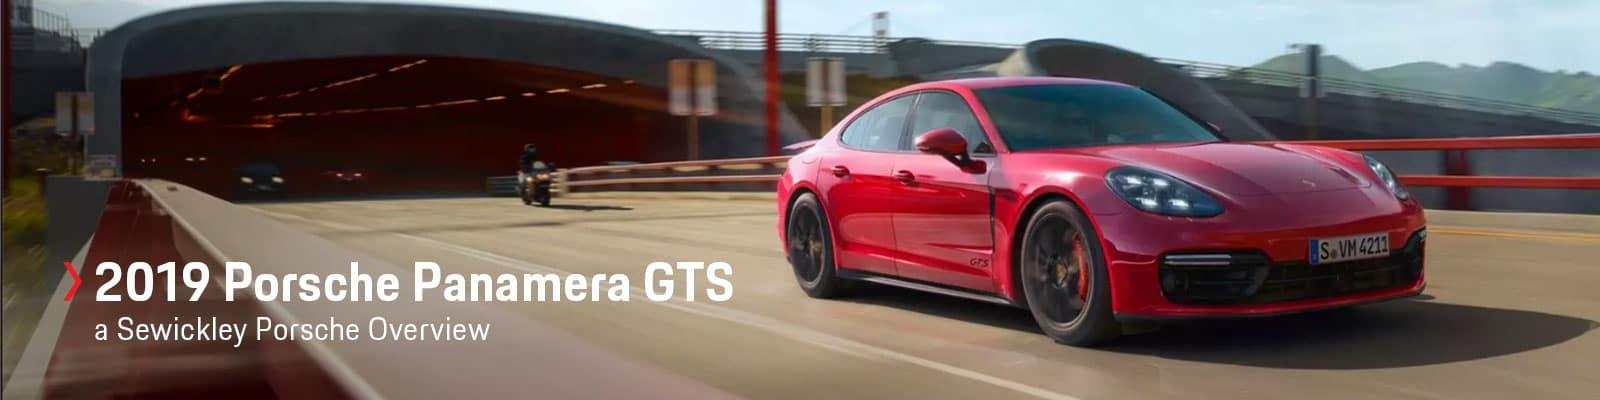 2019 Porsche Panamera GTS Model Overview at Sewickley Porsche